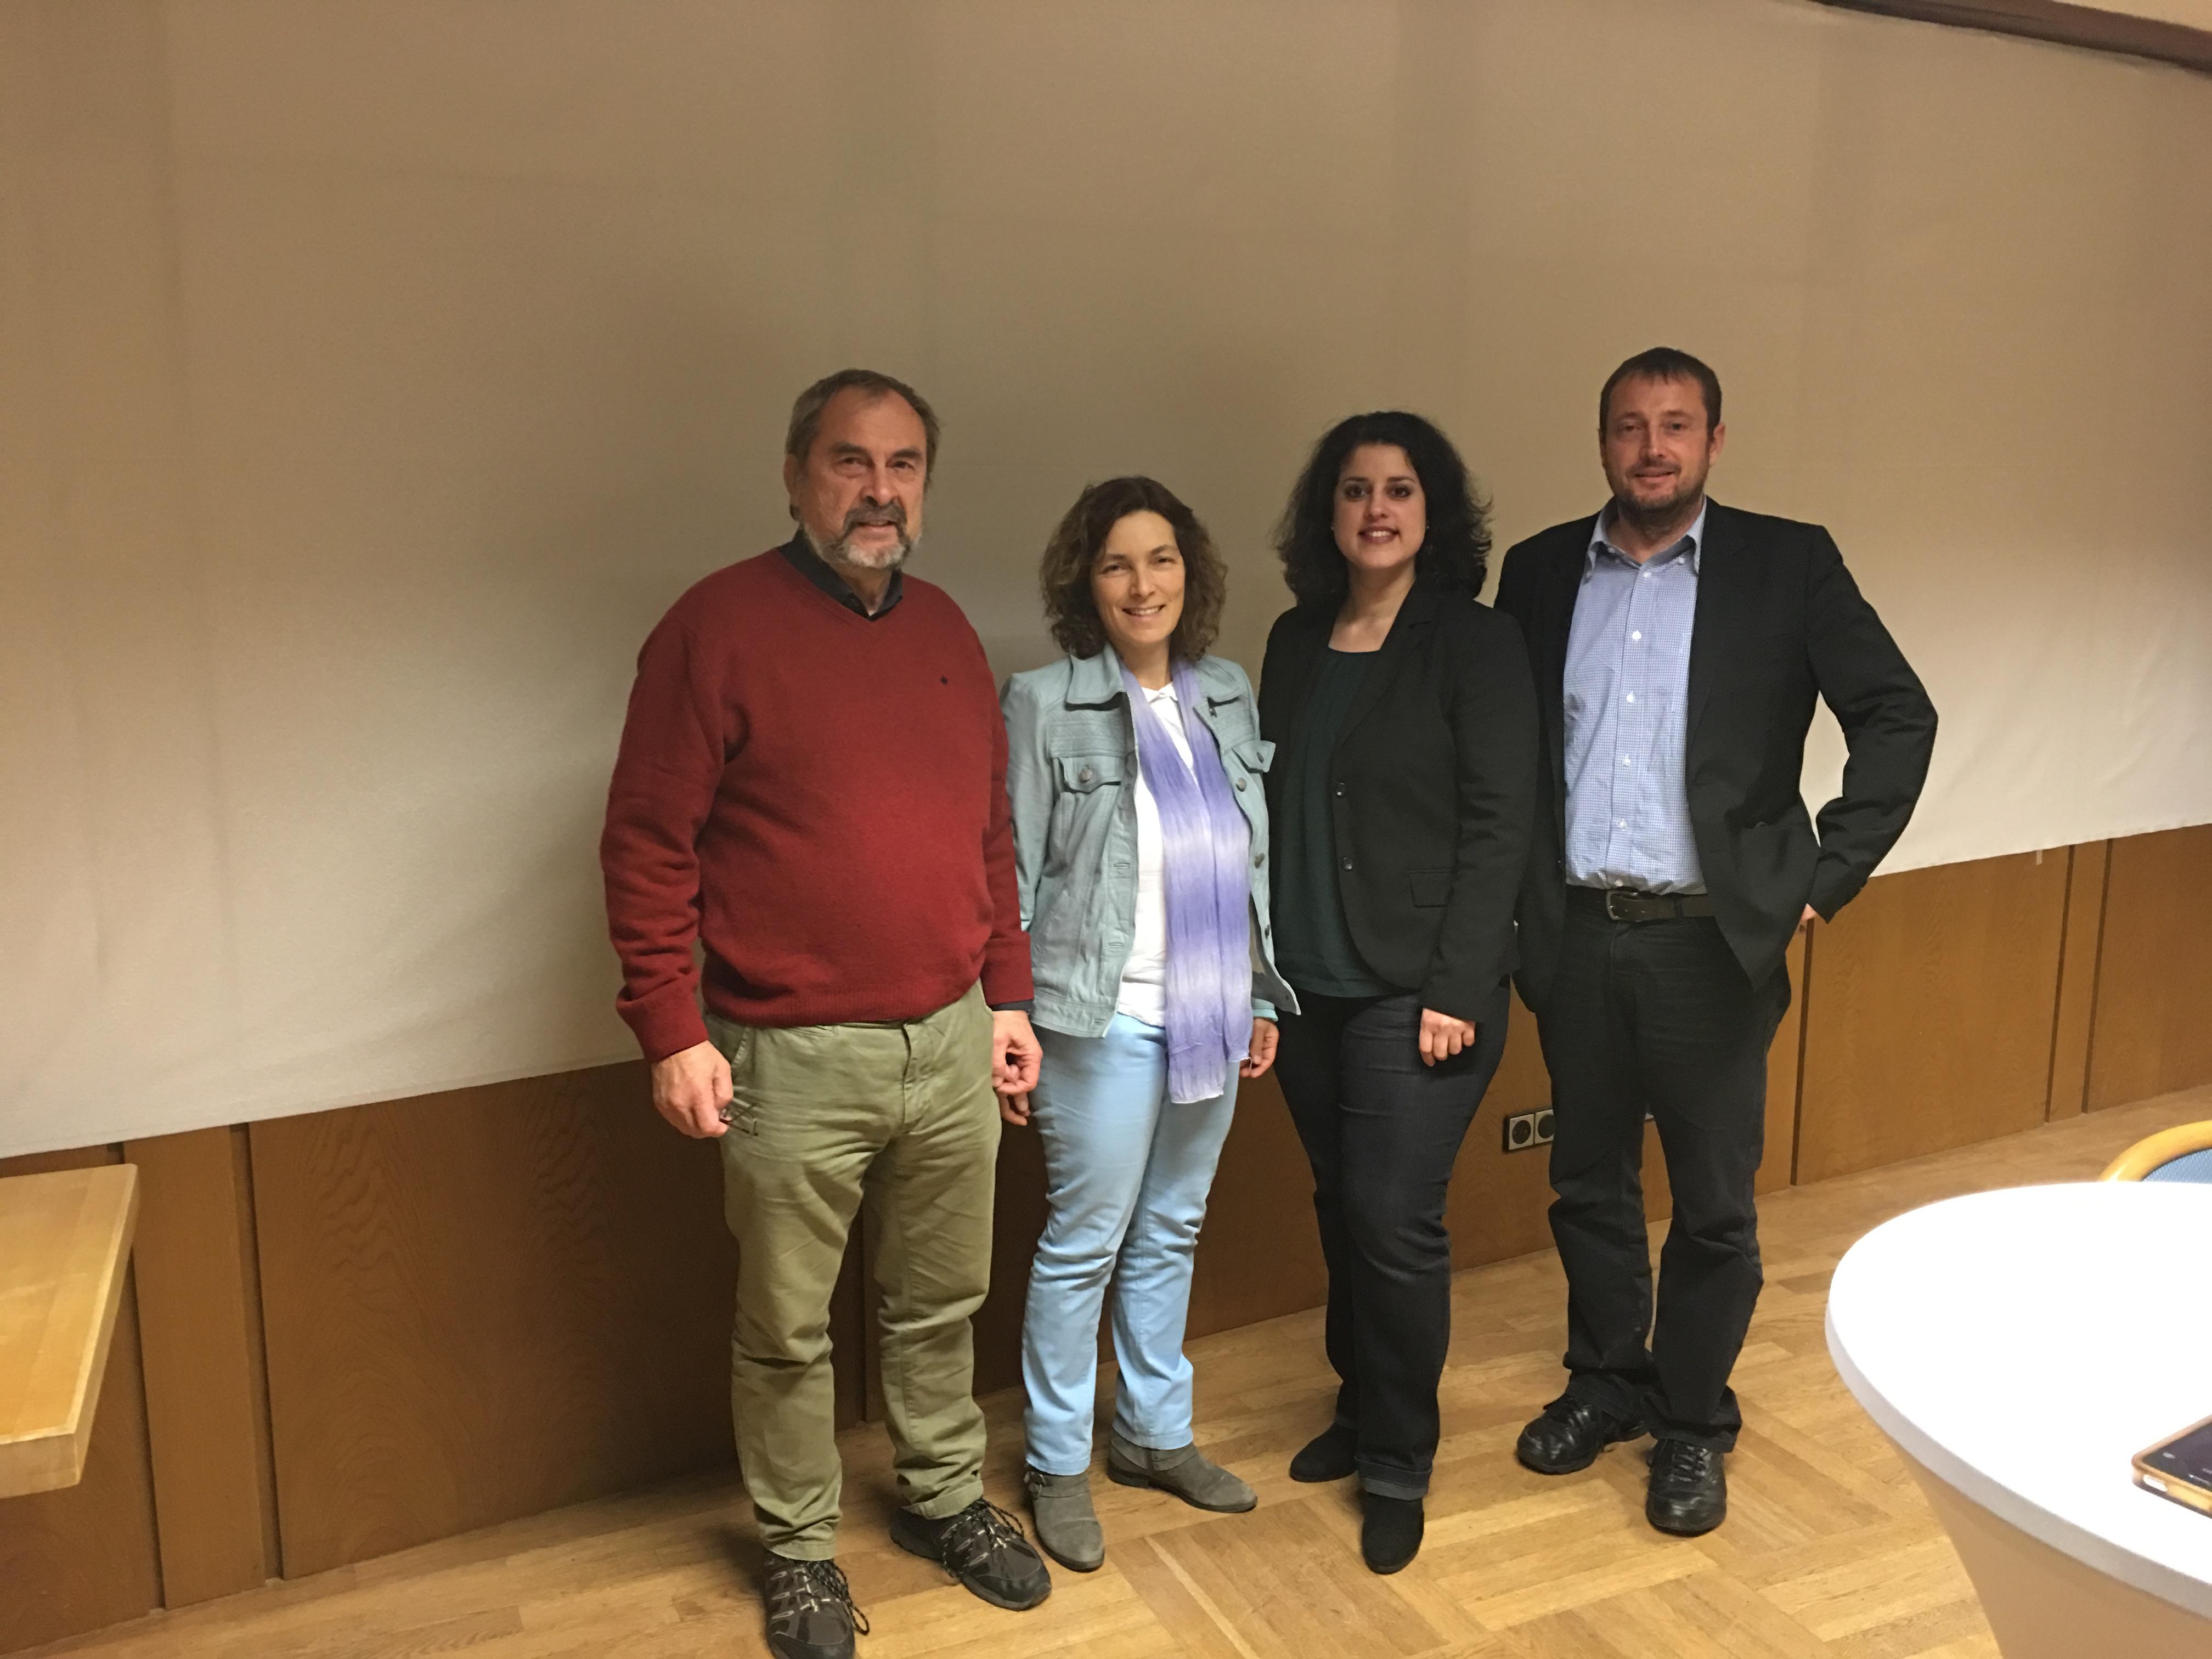 Von links nach rechts: Walter Feineis, Kerstin Celina, Homaira Mansury, Norbert Zirnsack